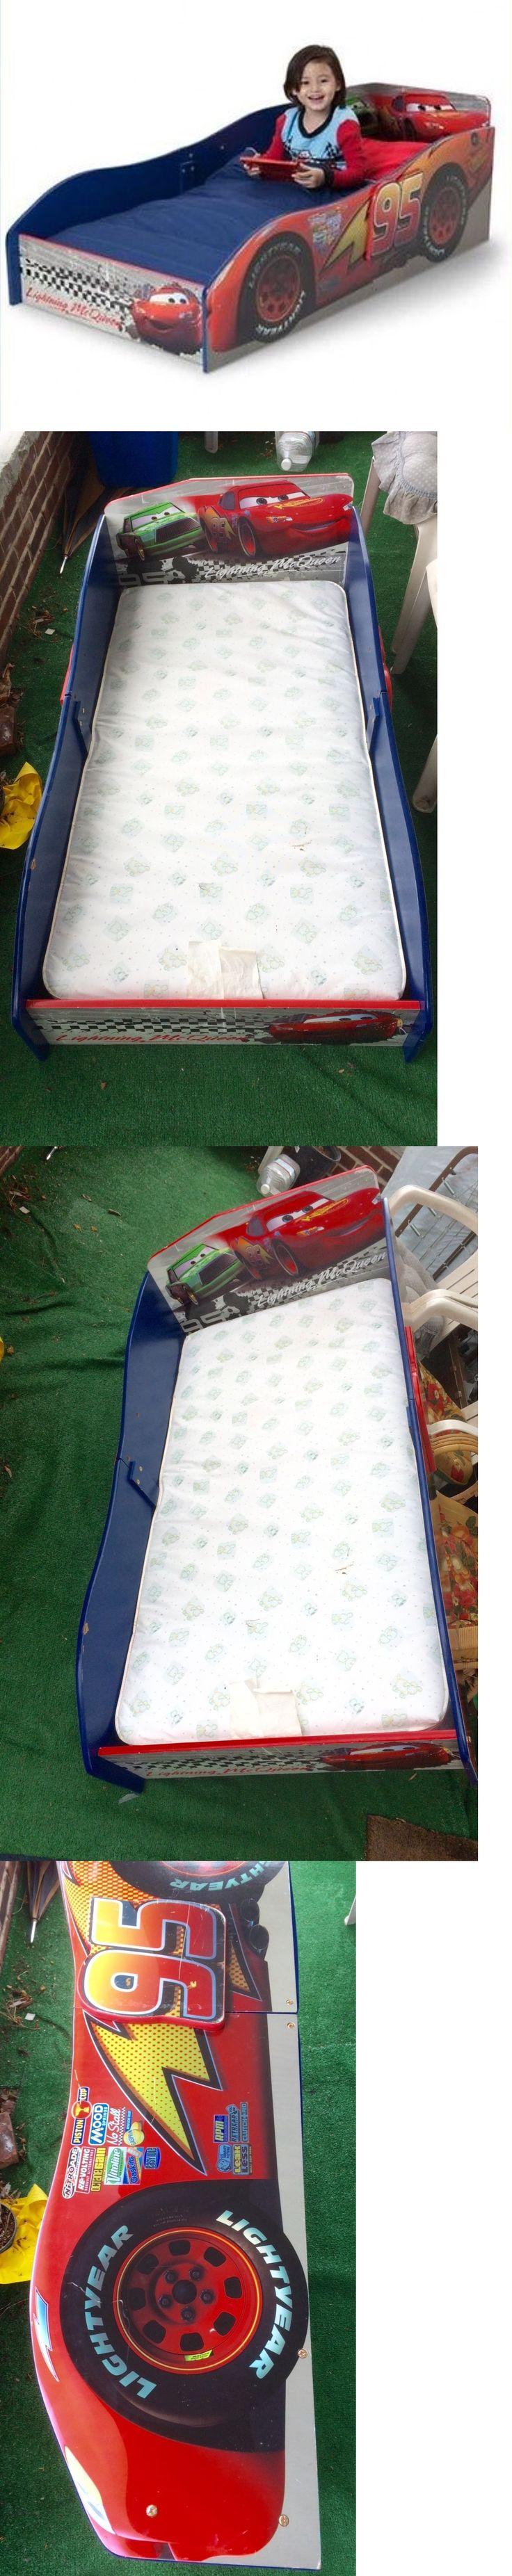 Kids Furniture: Kids Bed Boys Disney Cars Wooden Baby Children Delta Furniture Toddler Bed -> BUY IT NOW ONLY: $50 on eBay!